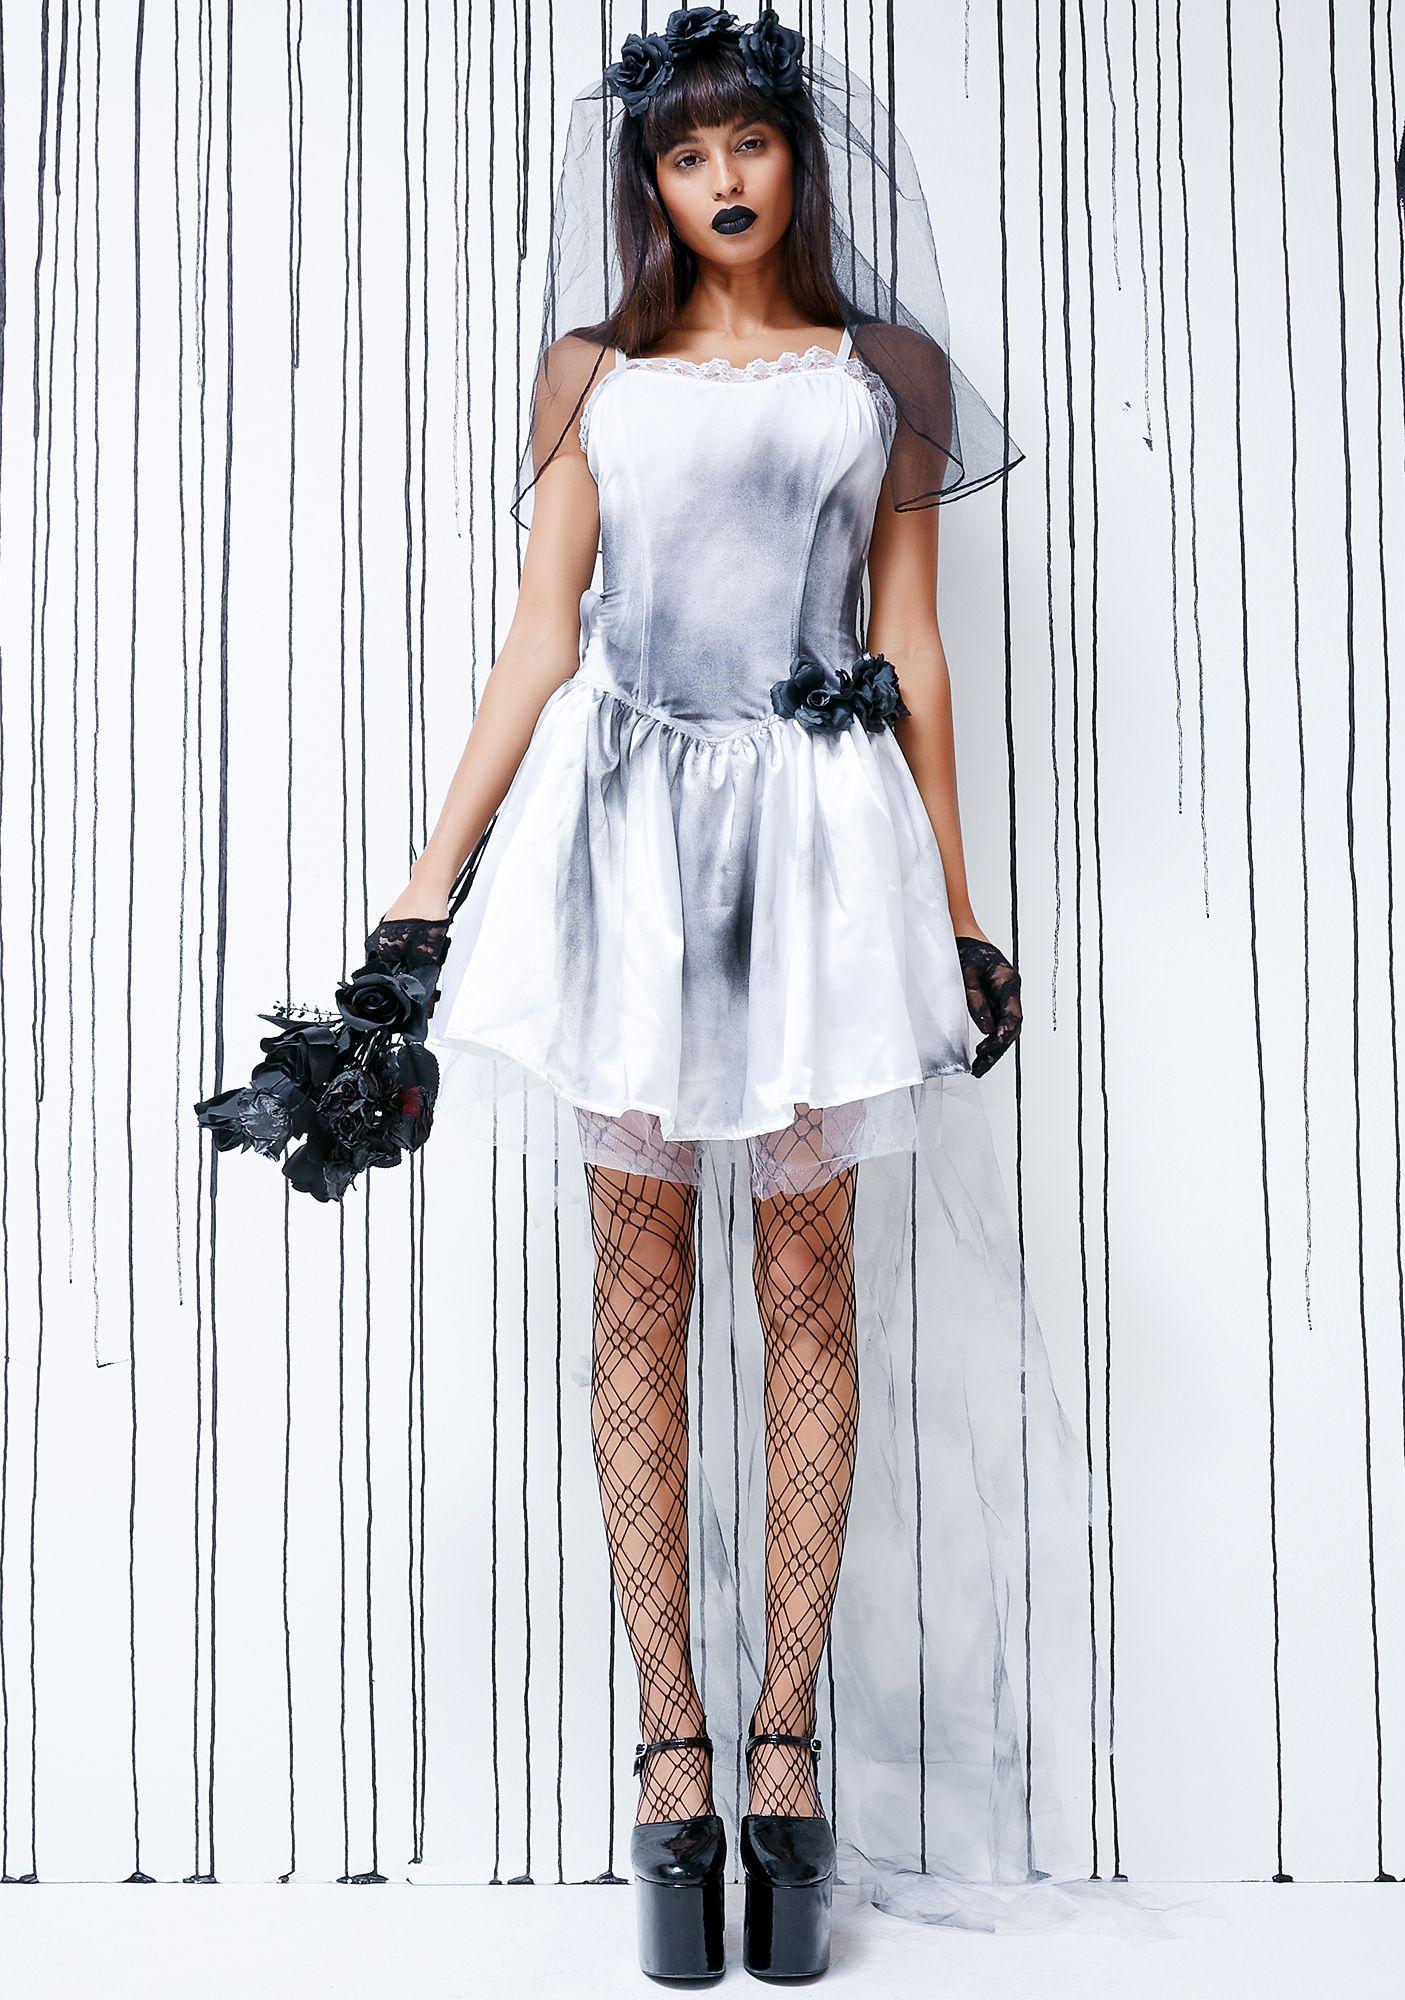 5a343e0ca3 Grave Proposal Bride Costume | Dress Up Fun | Bride costume ...